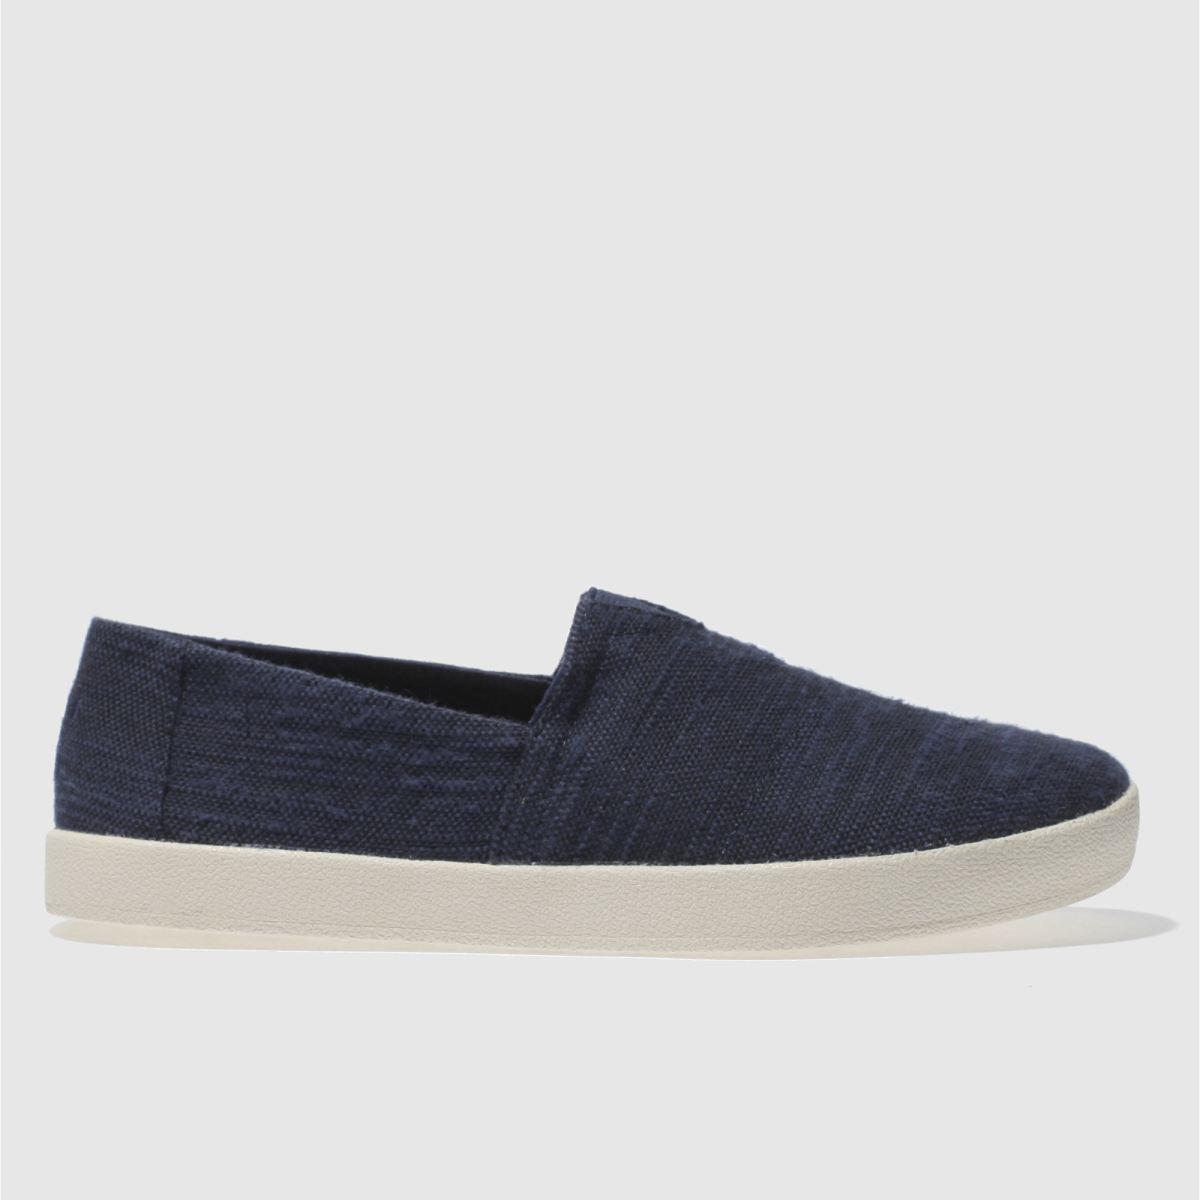 Toms Navy Avalon Slip-on Shoes